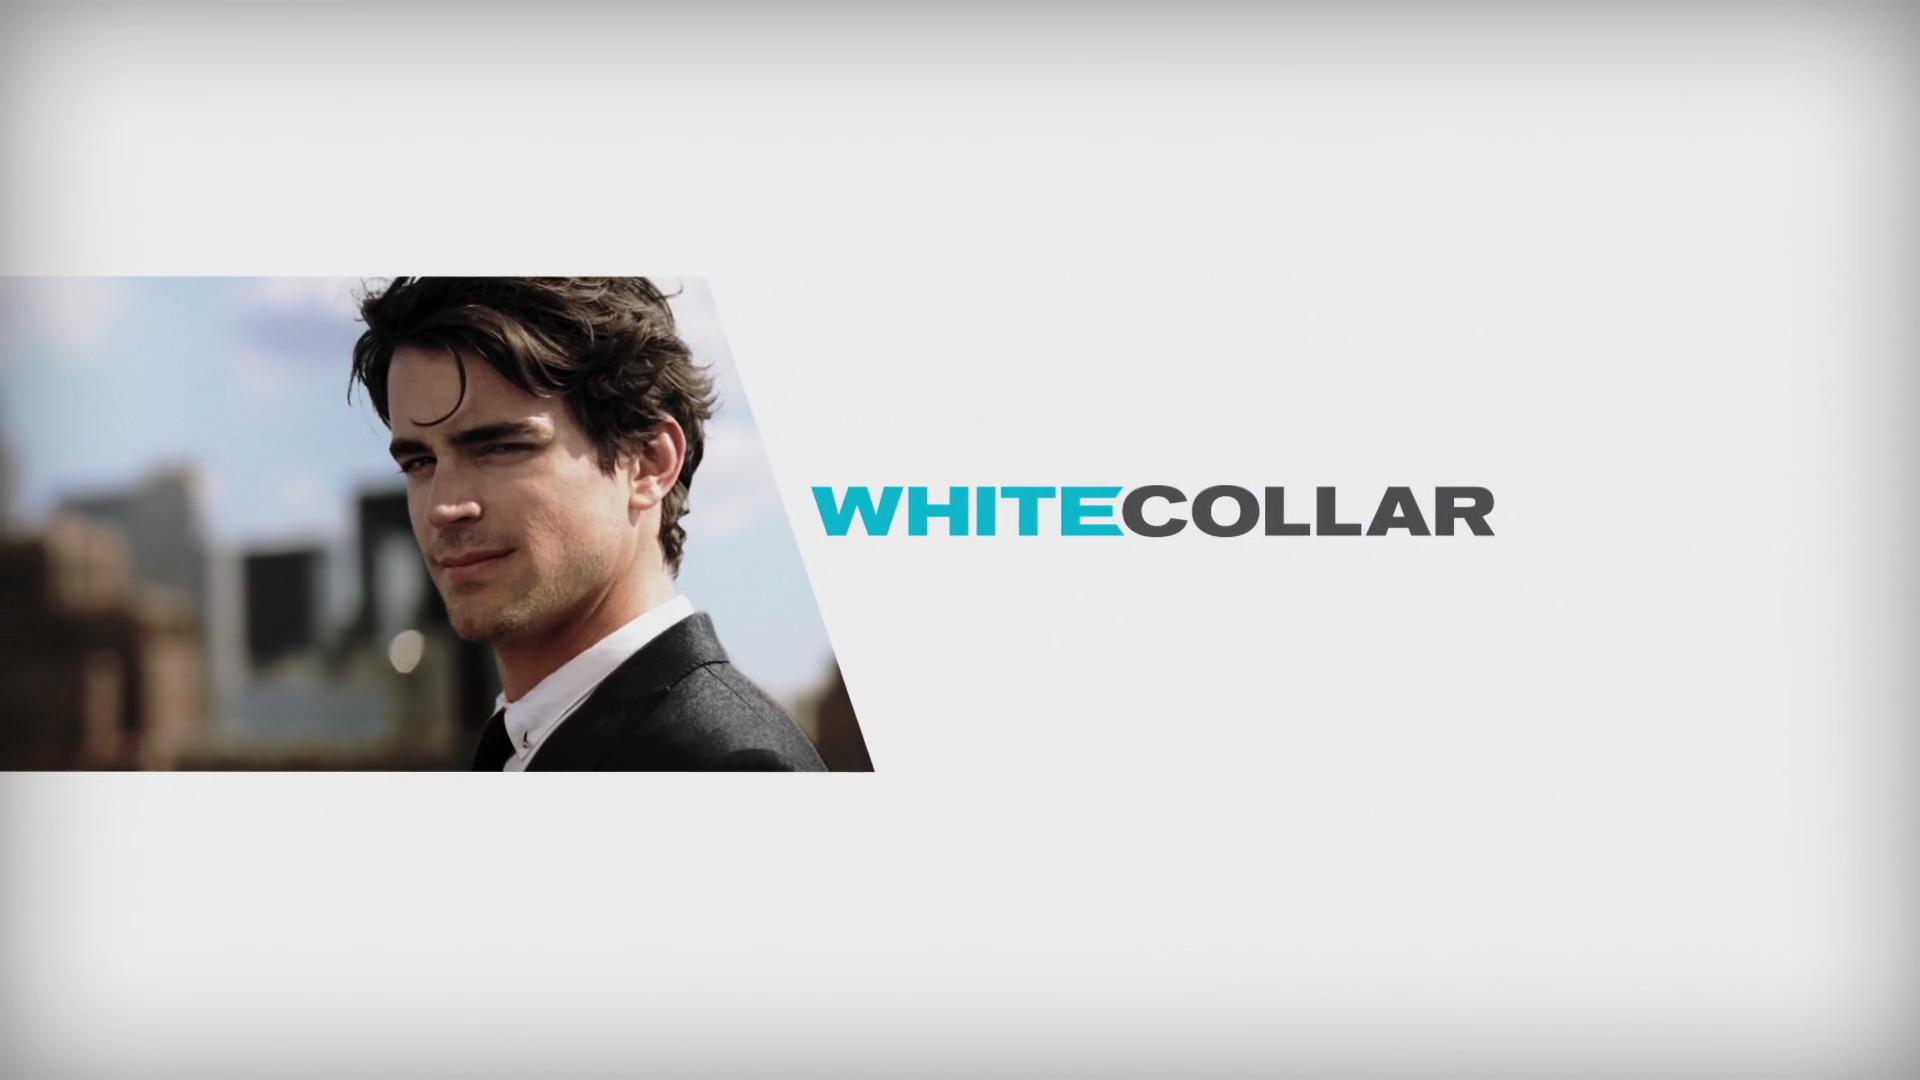 'White Collar' Season 6 Gallery Update